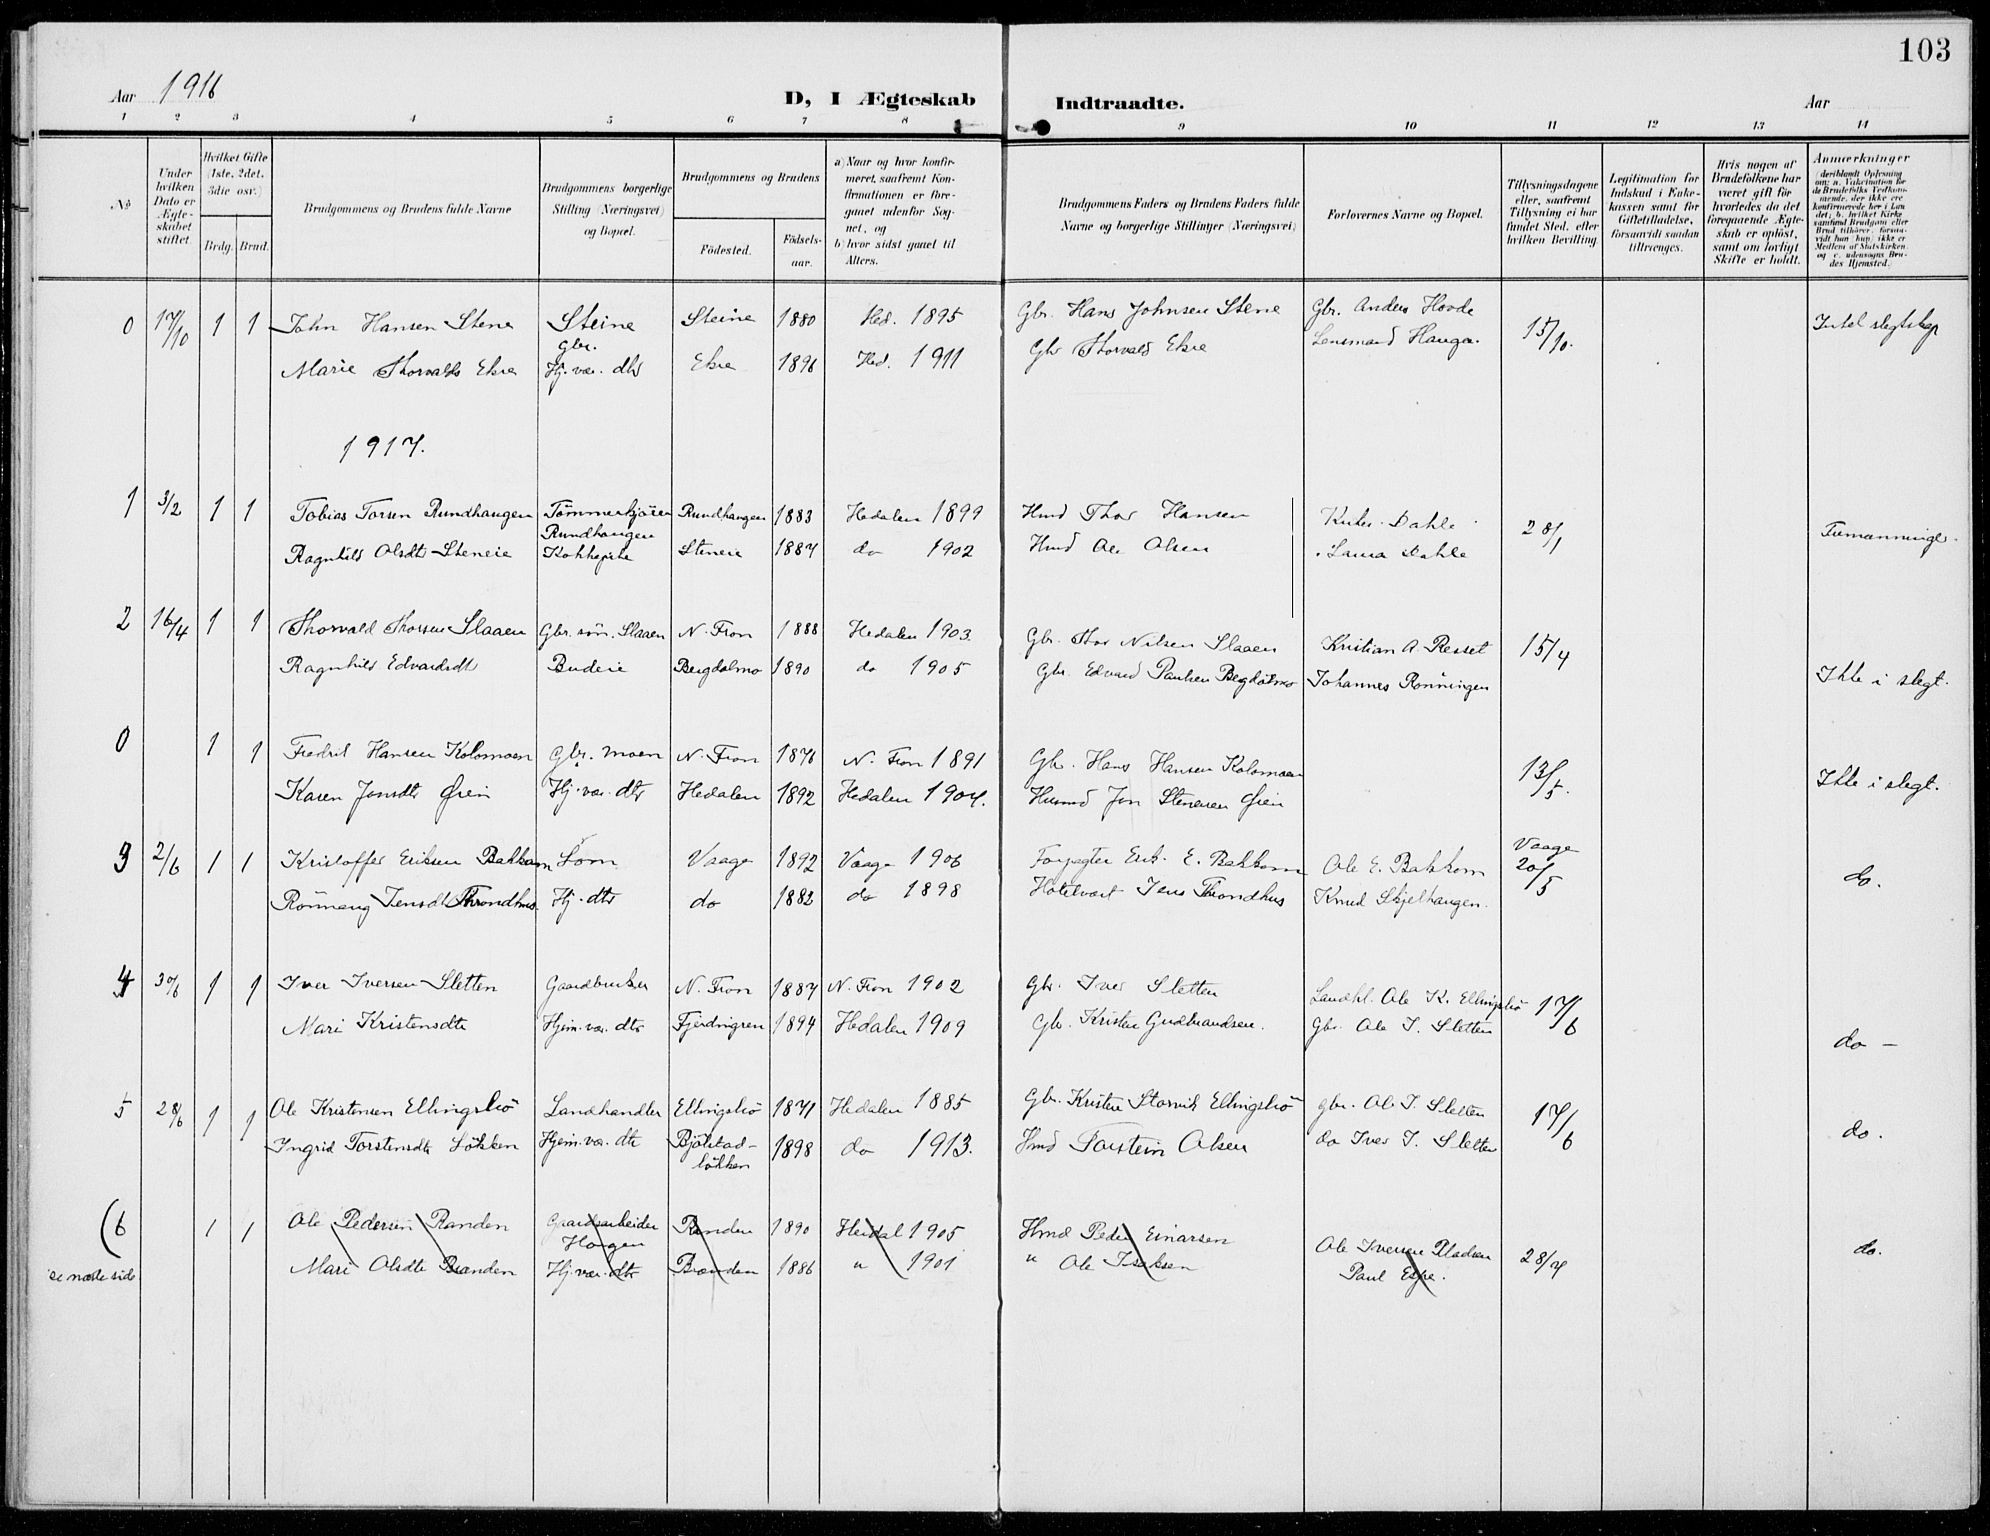 SAH, Sel prestekontor, Ministerialbok nr. 1, 1905-1922, s. 103